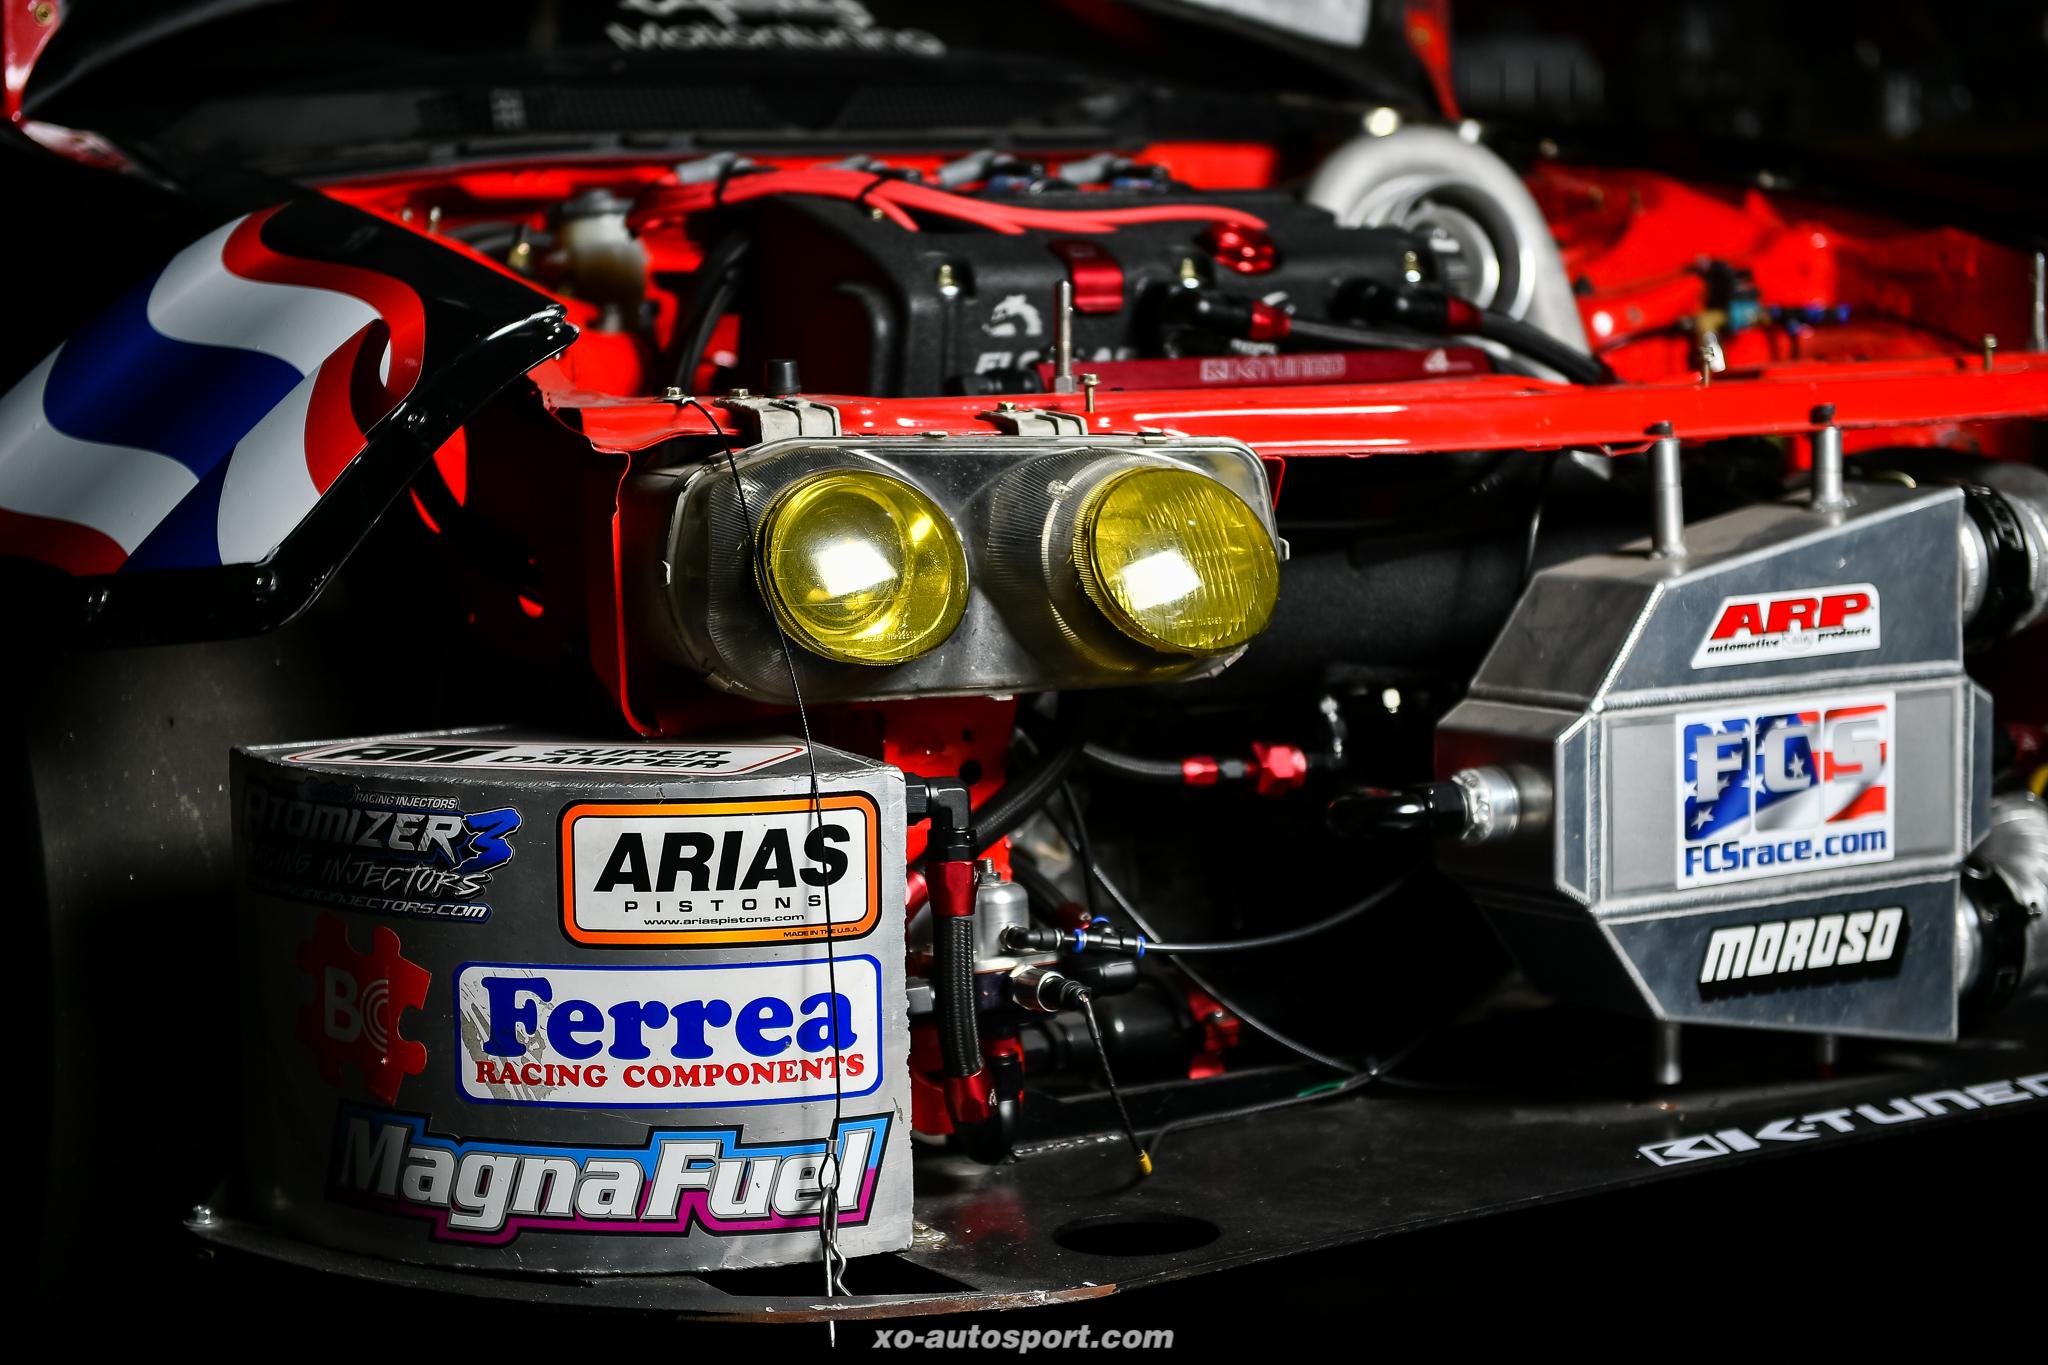 INTEGRA DC2 PRO 4 FWD Champion by FLOW LAB CNC 26